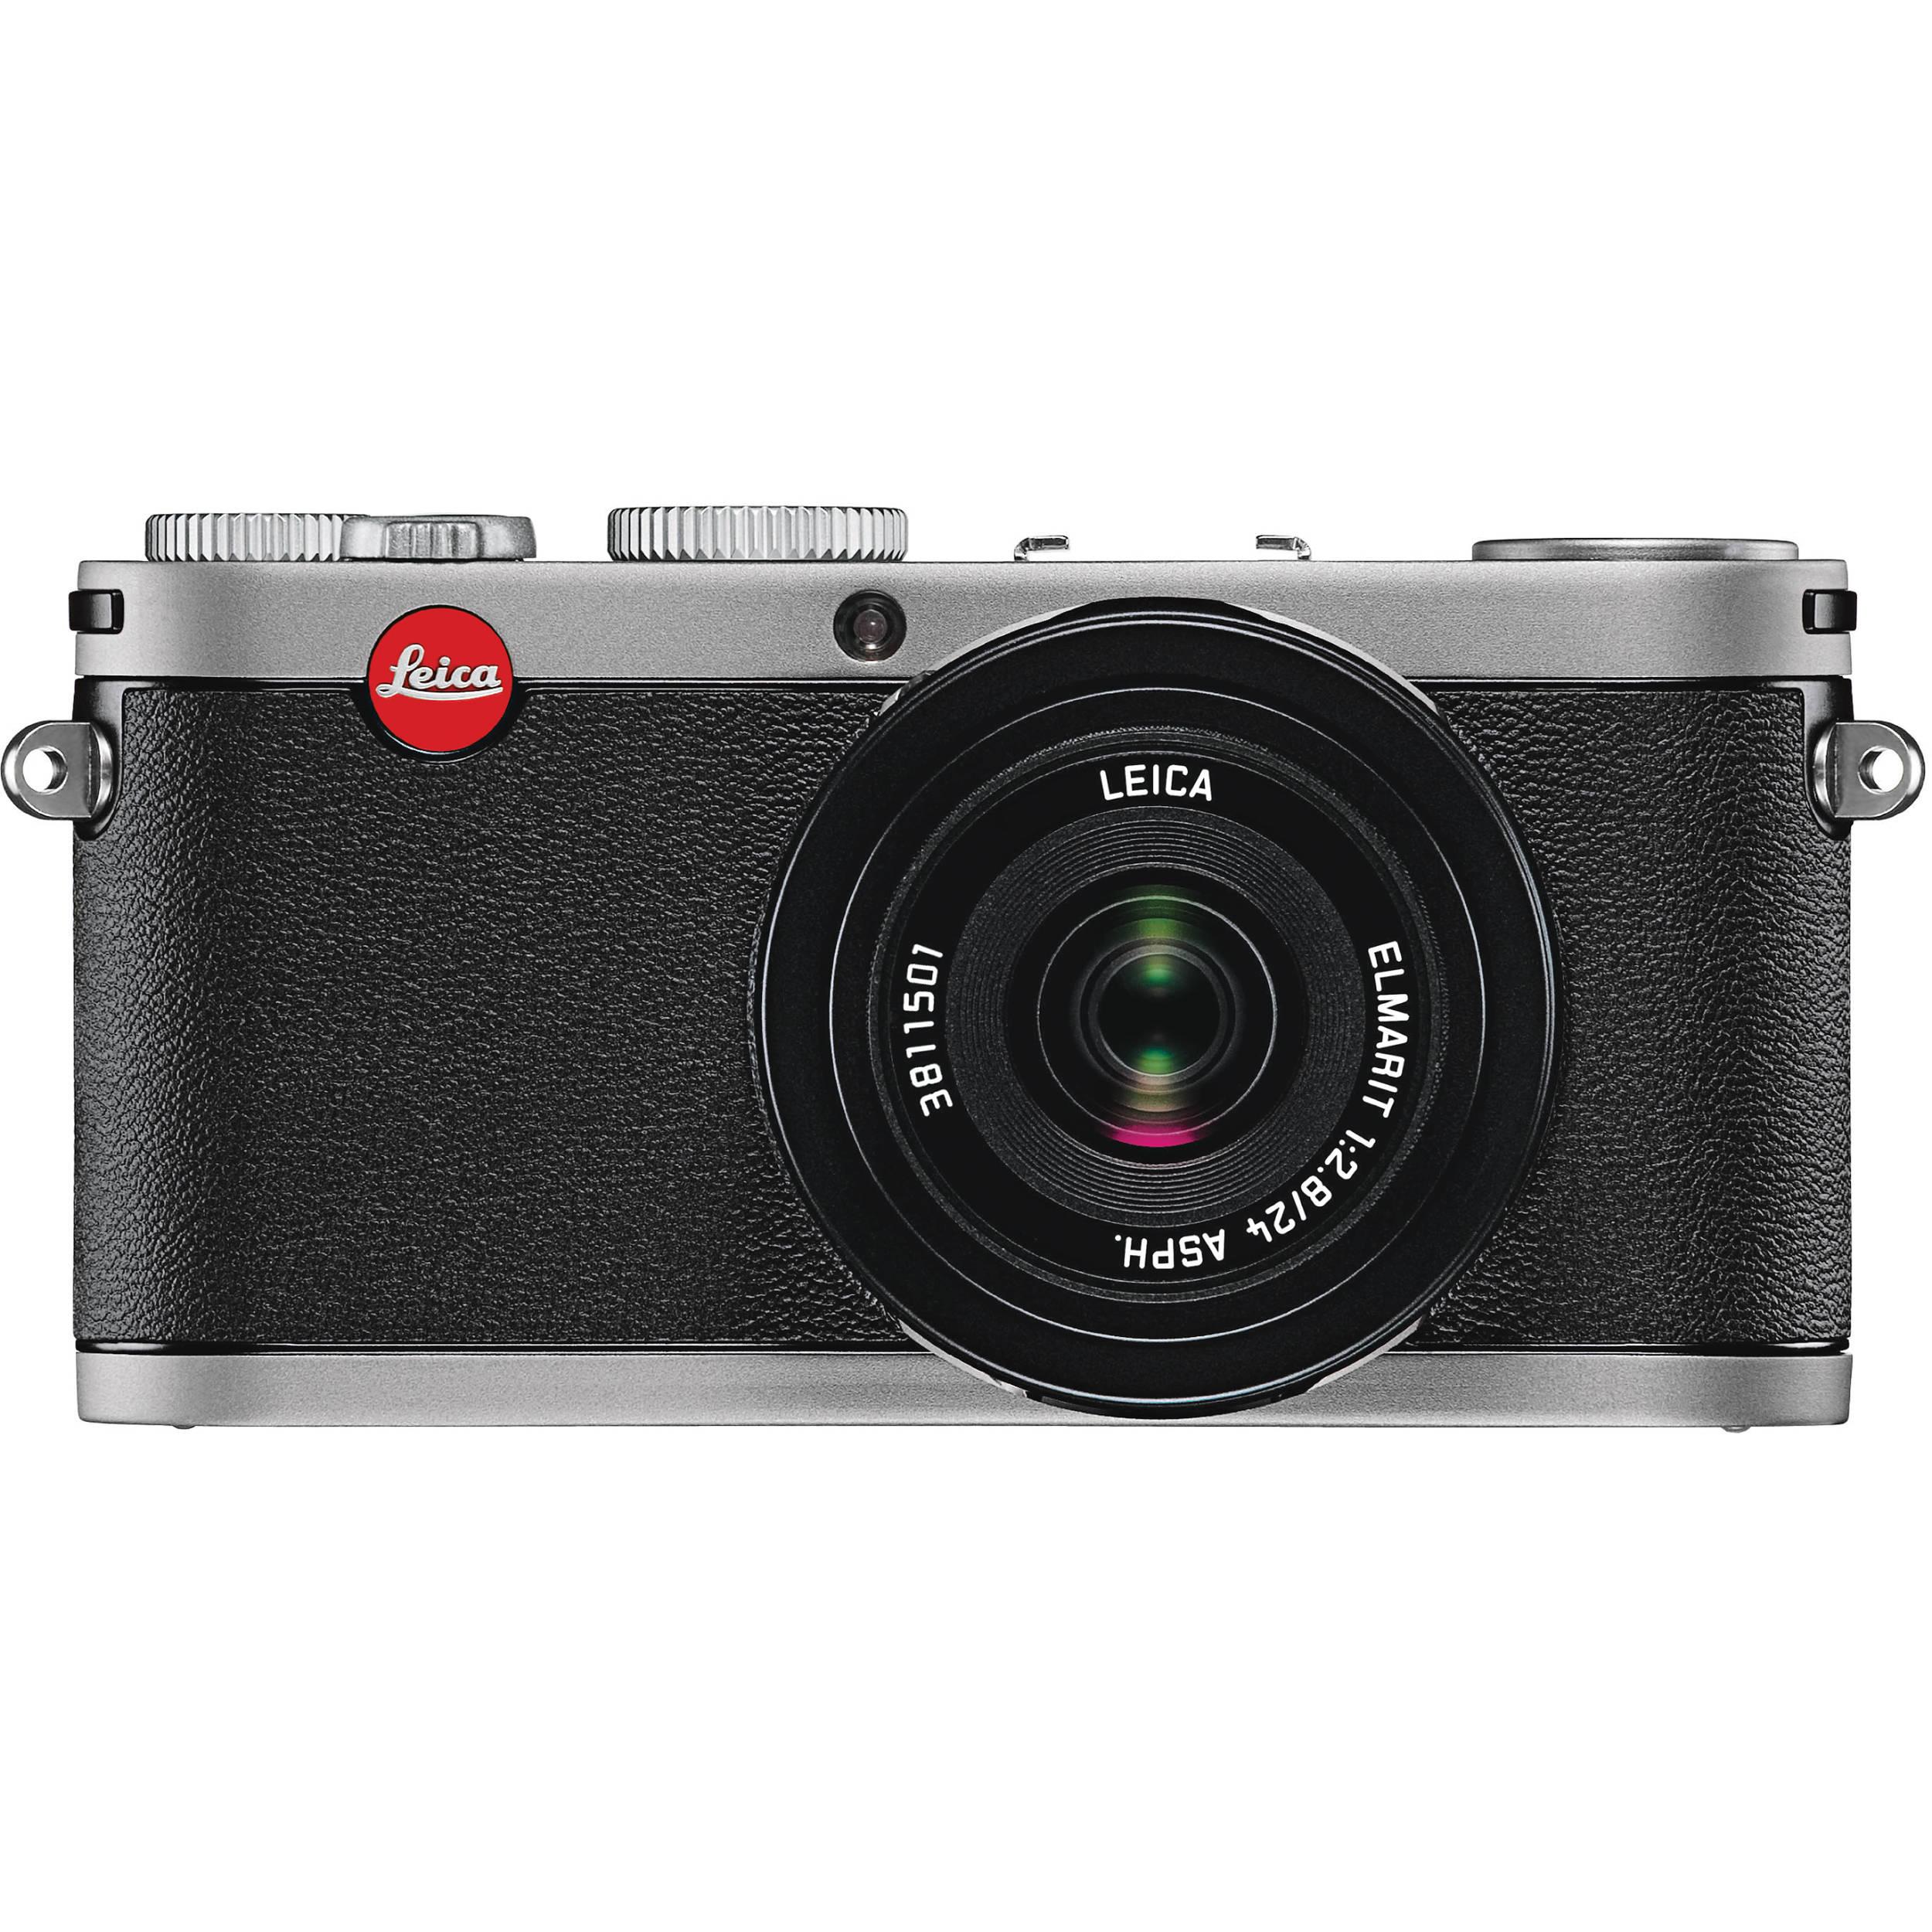 leica x1 digital compact camera with elmarit 24mm f 2 8 18420 rh bhphotovideo com Leica D-LUX 2 Original Leica 1